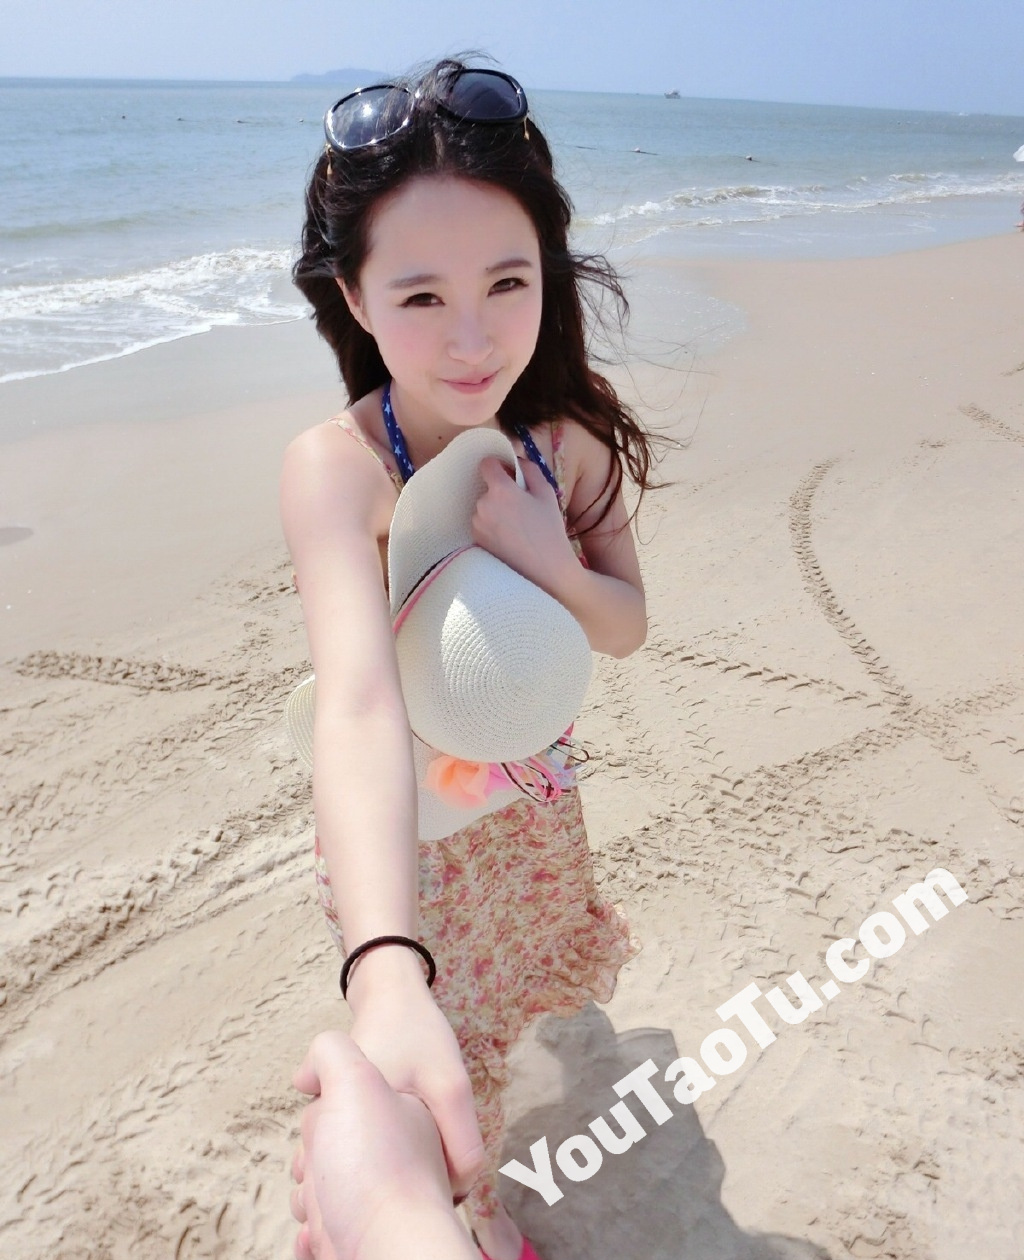 KK22 成熟美女350张 自拍生活照-1